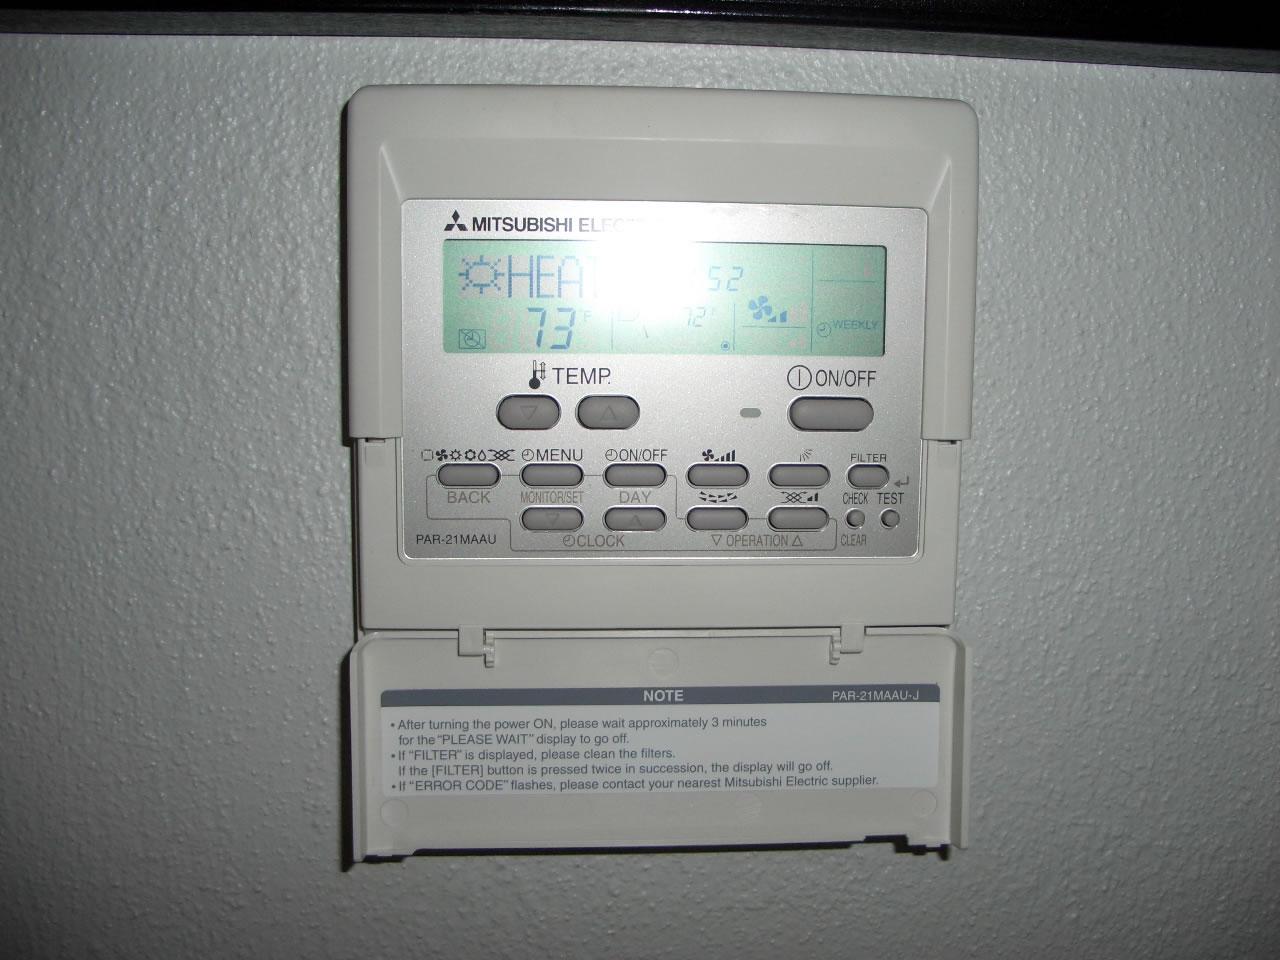 Daikin troubleshooting manual wall Controller installation